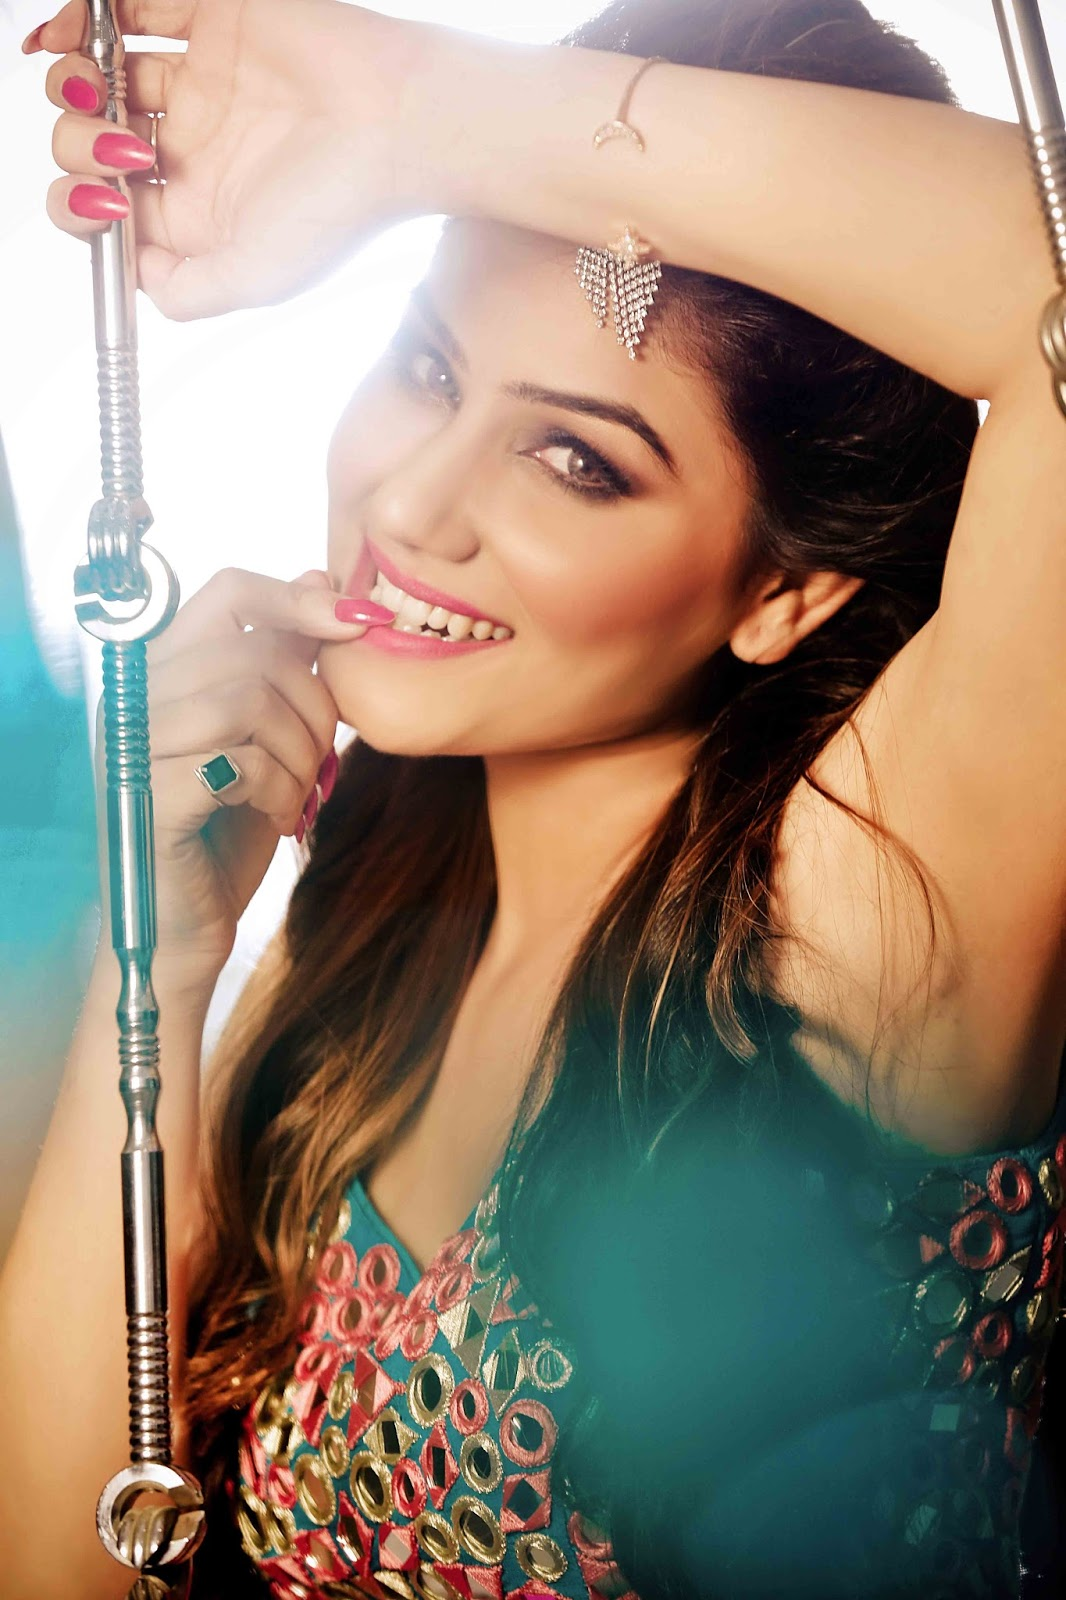 Kangna Sharma armpits, Kangna Sharma sexy wallpapers